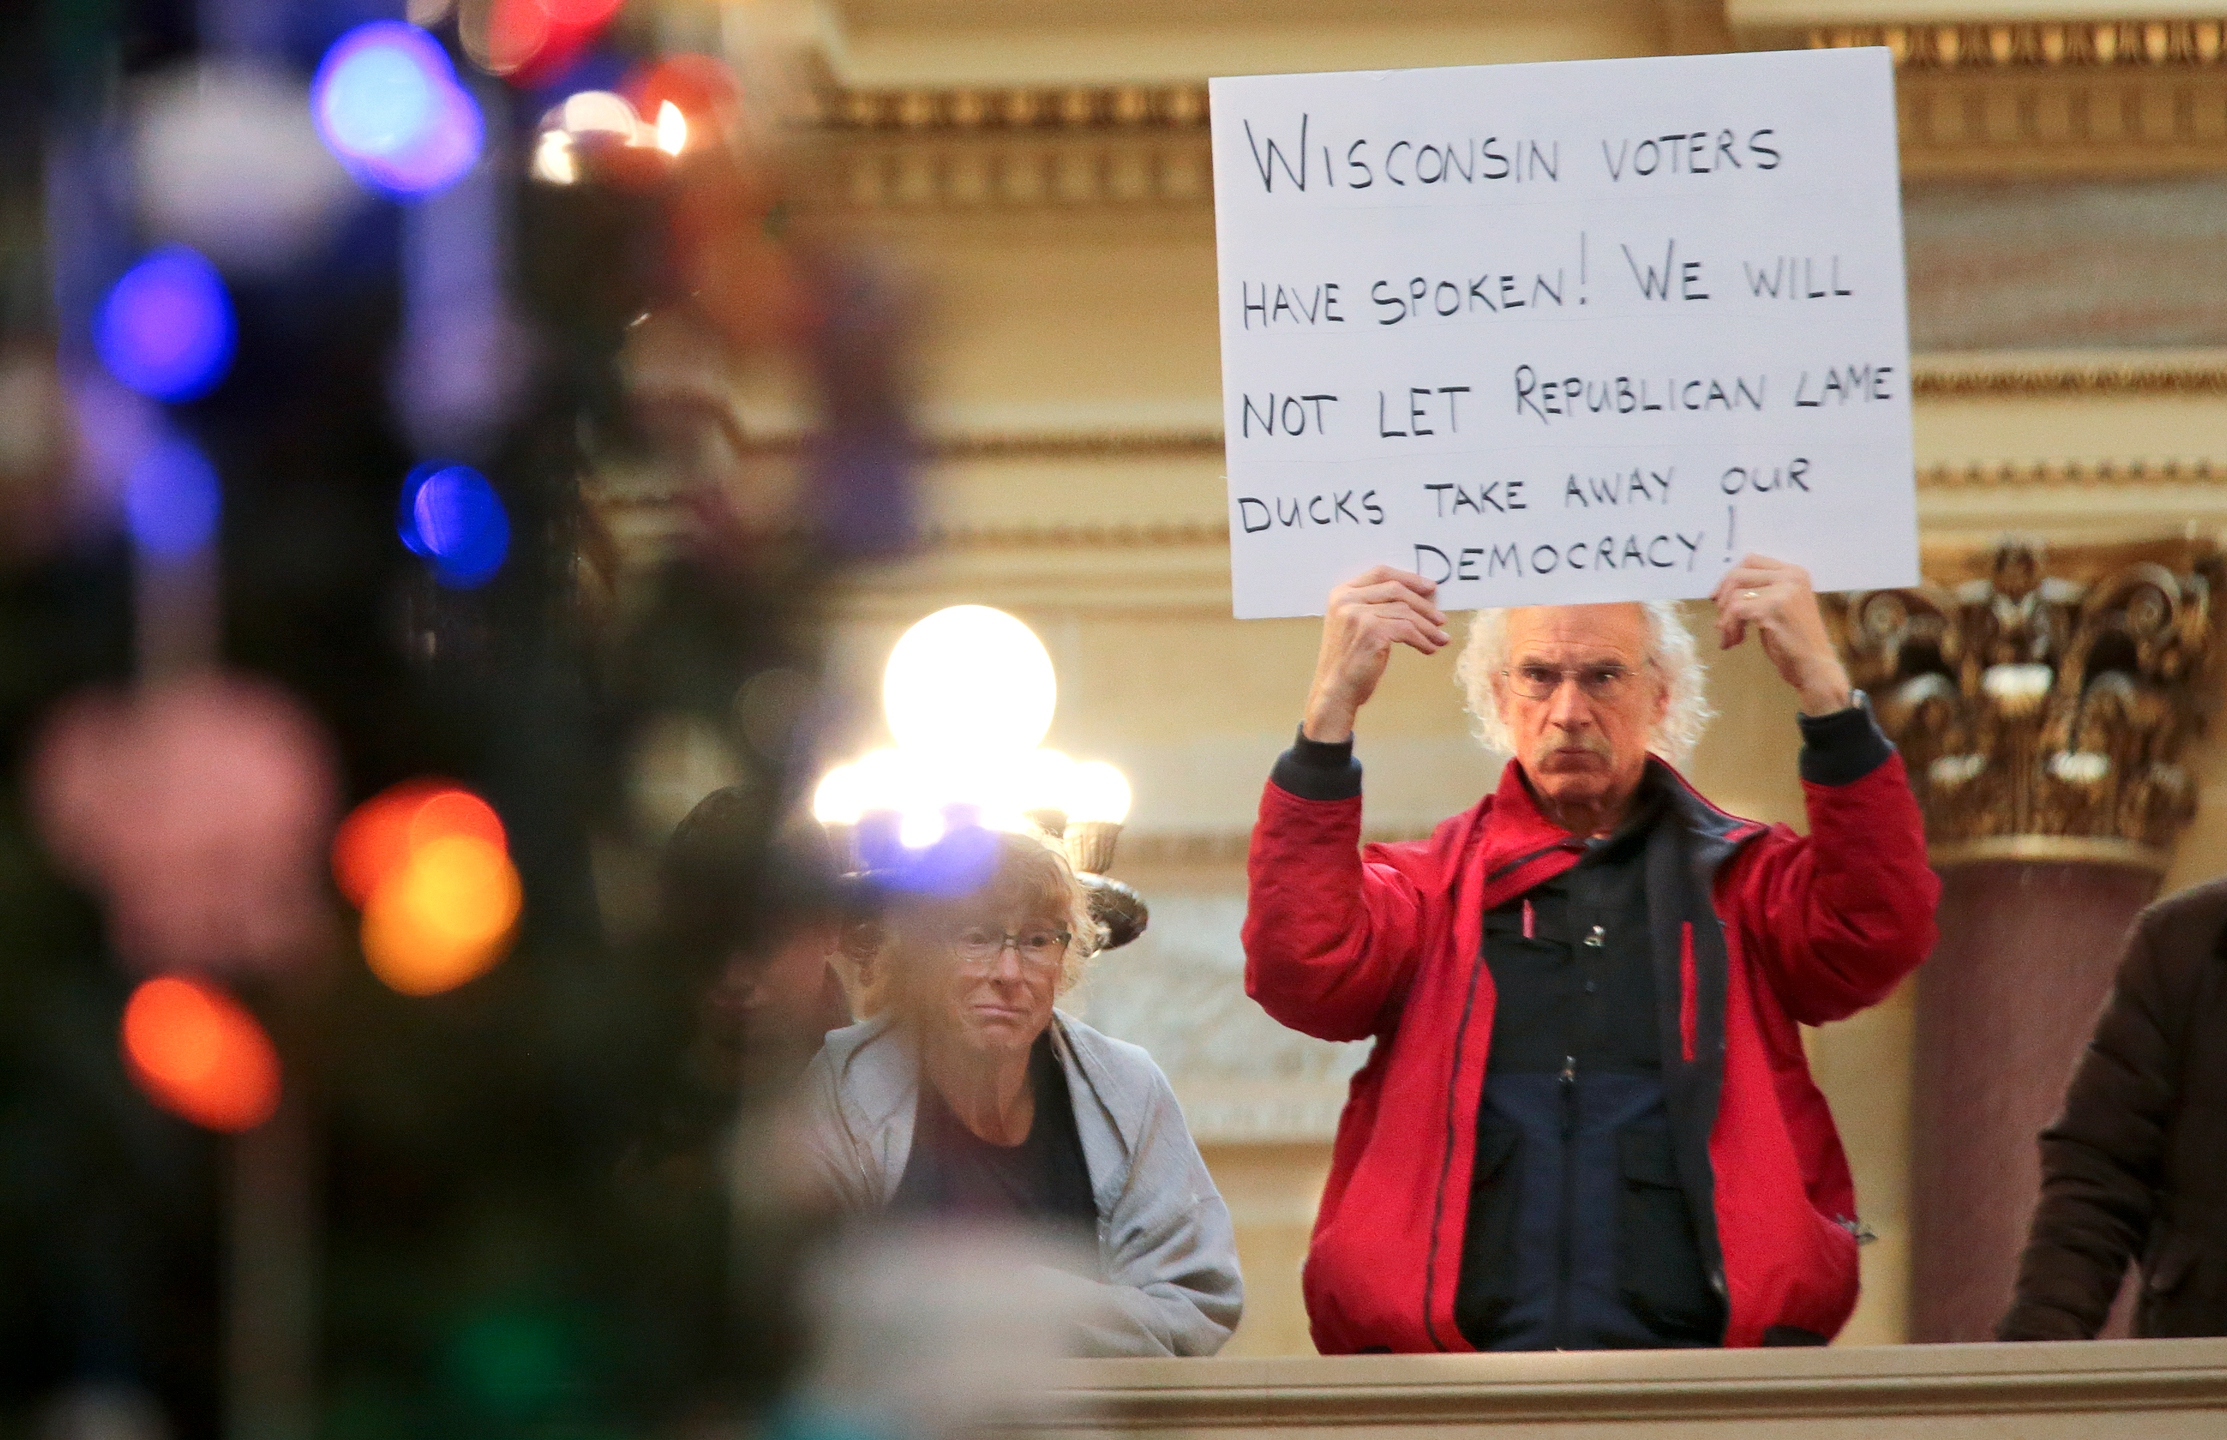 Wisconsin_Legislature-Lame_Duck_28669-159532.jpg96909783